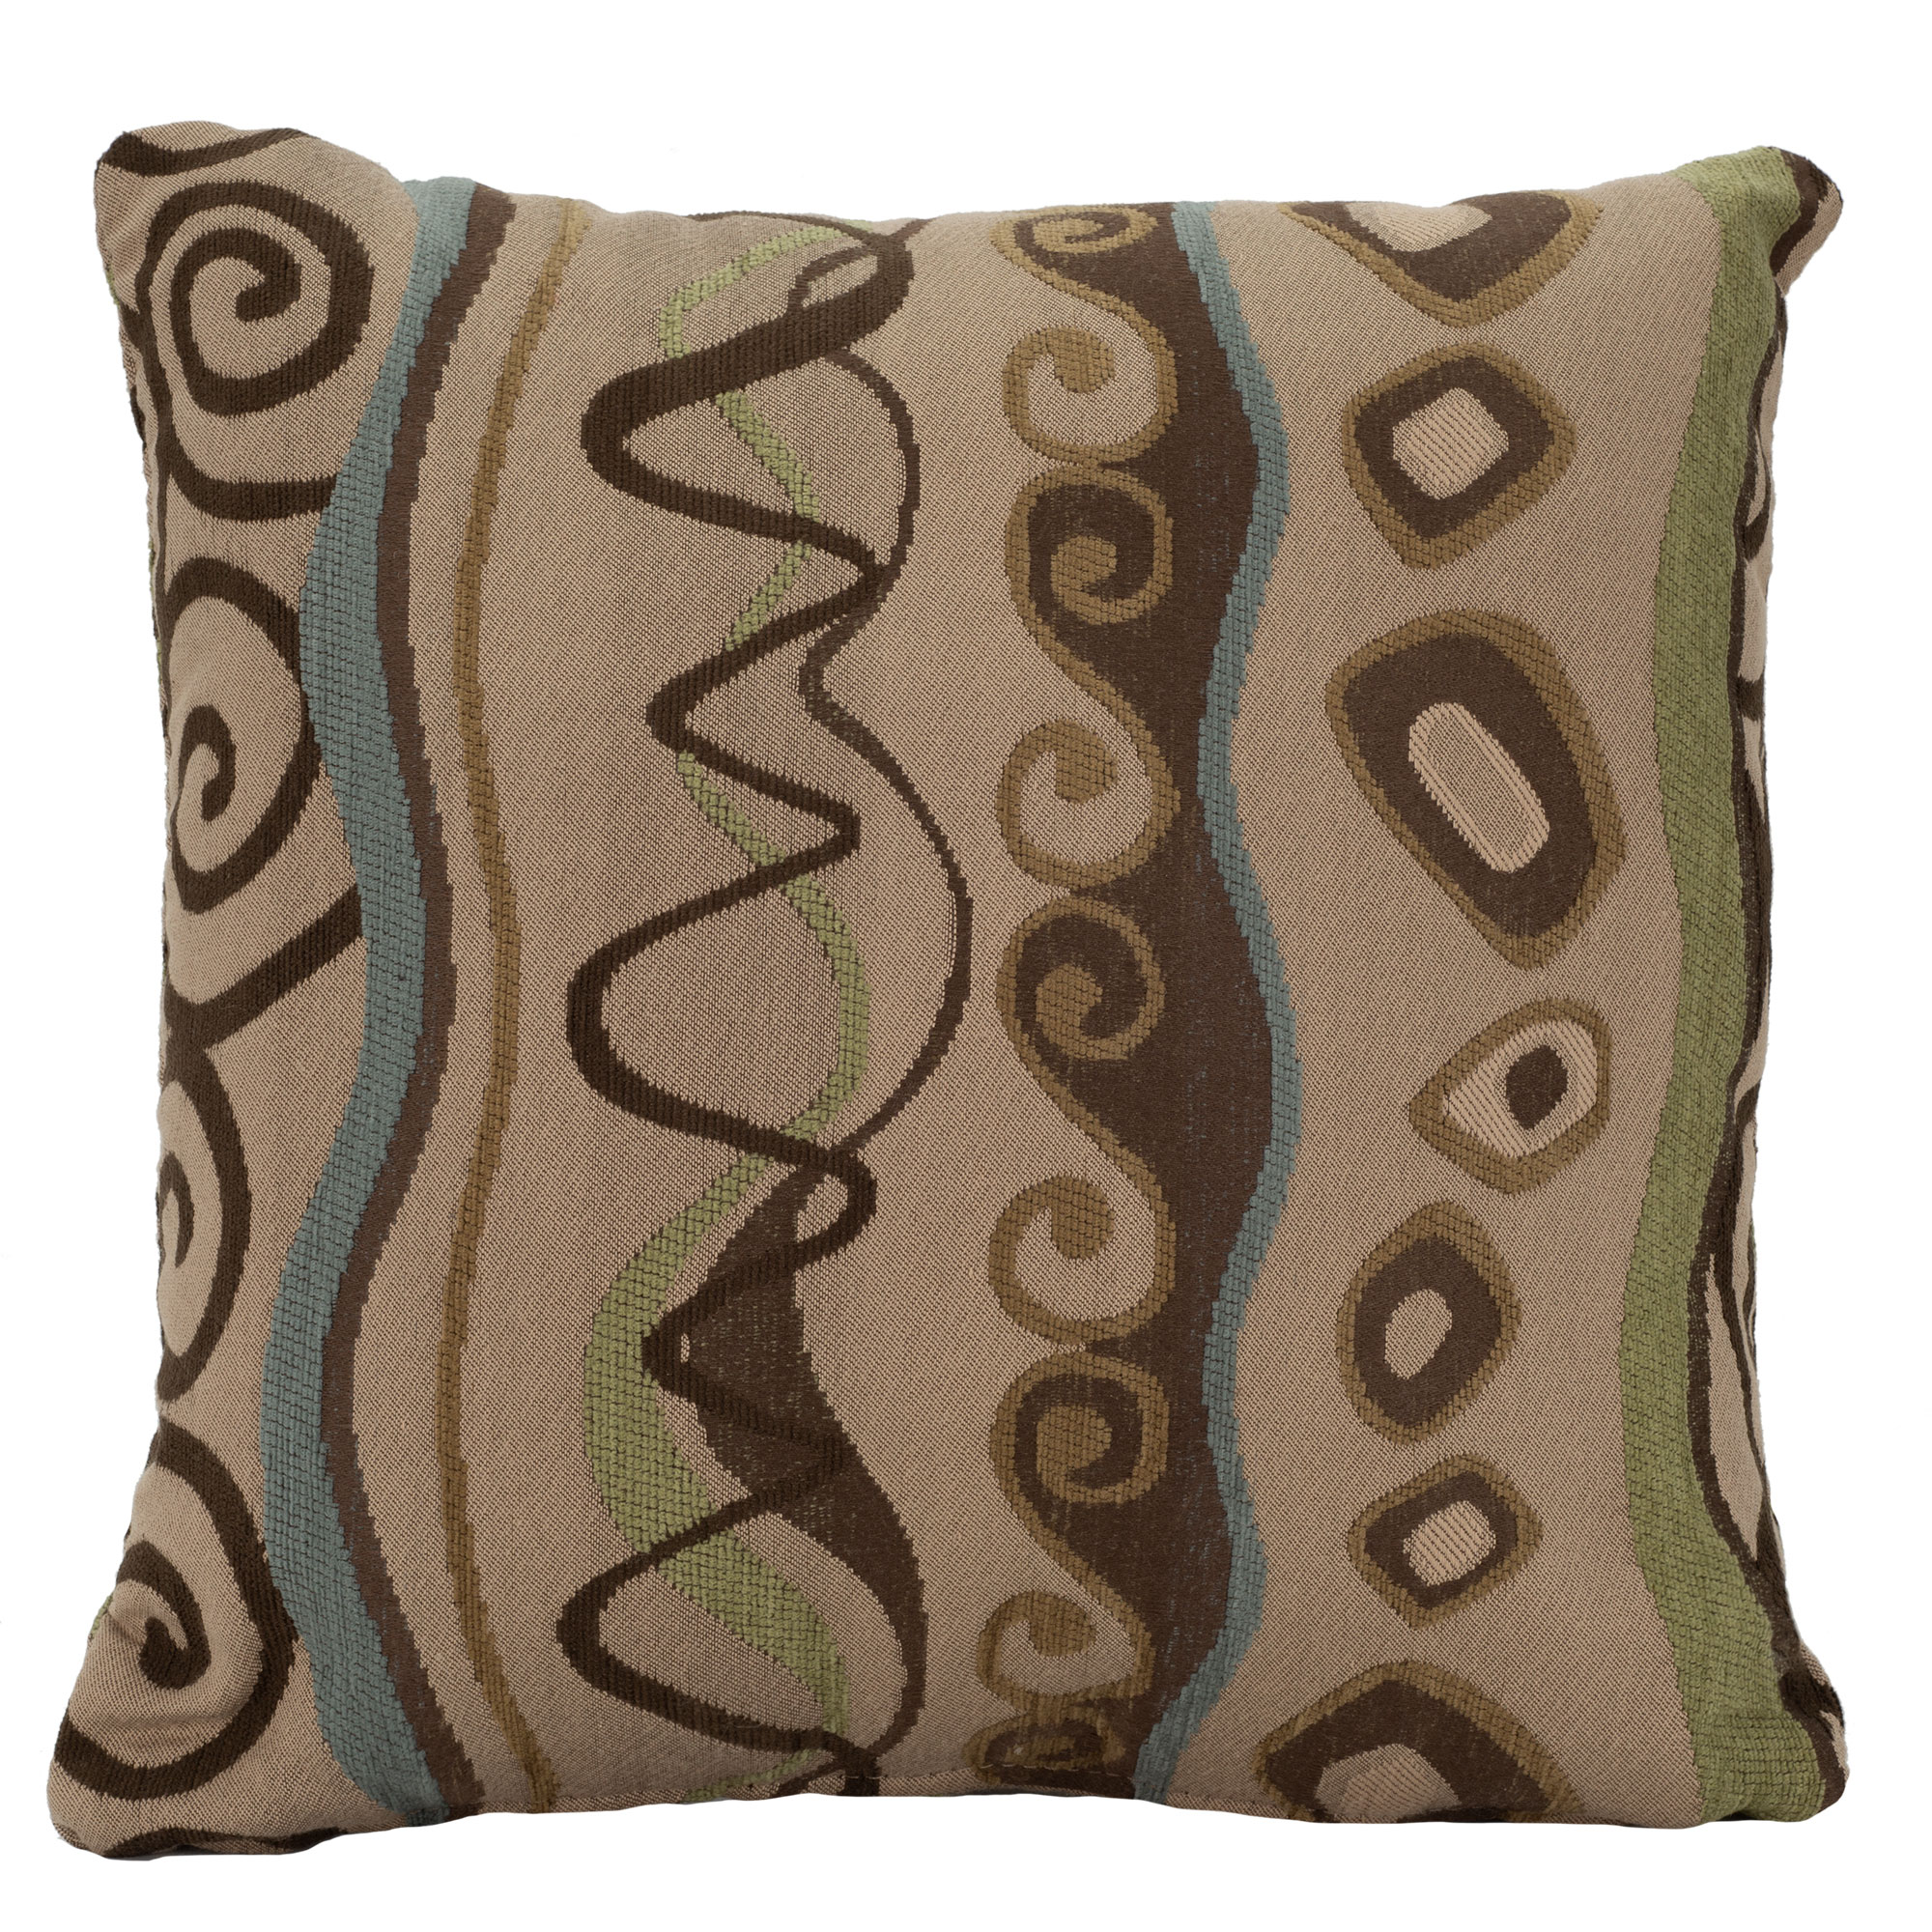 RV Decorative Pillow